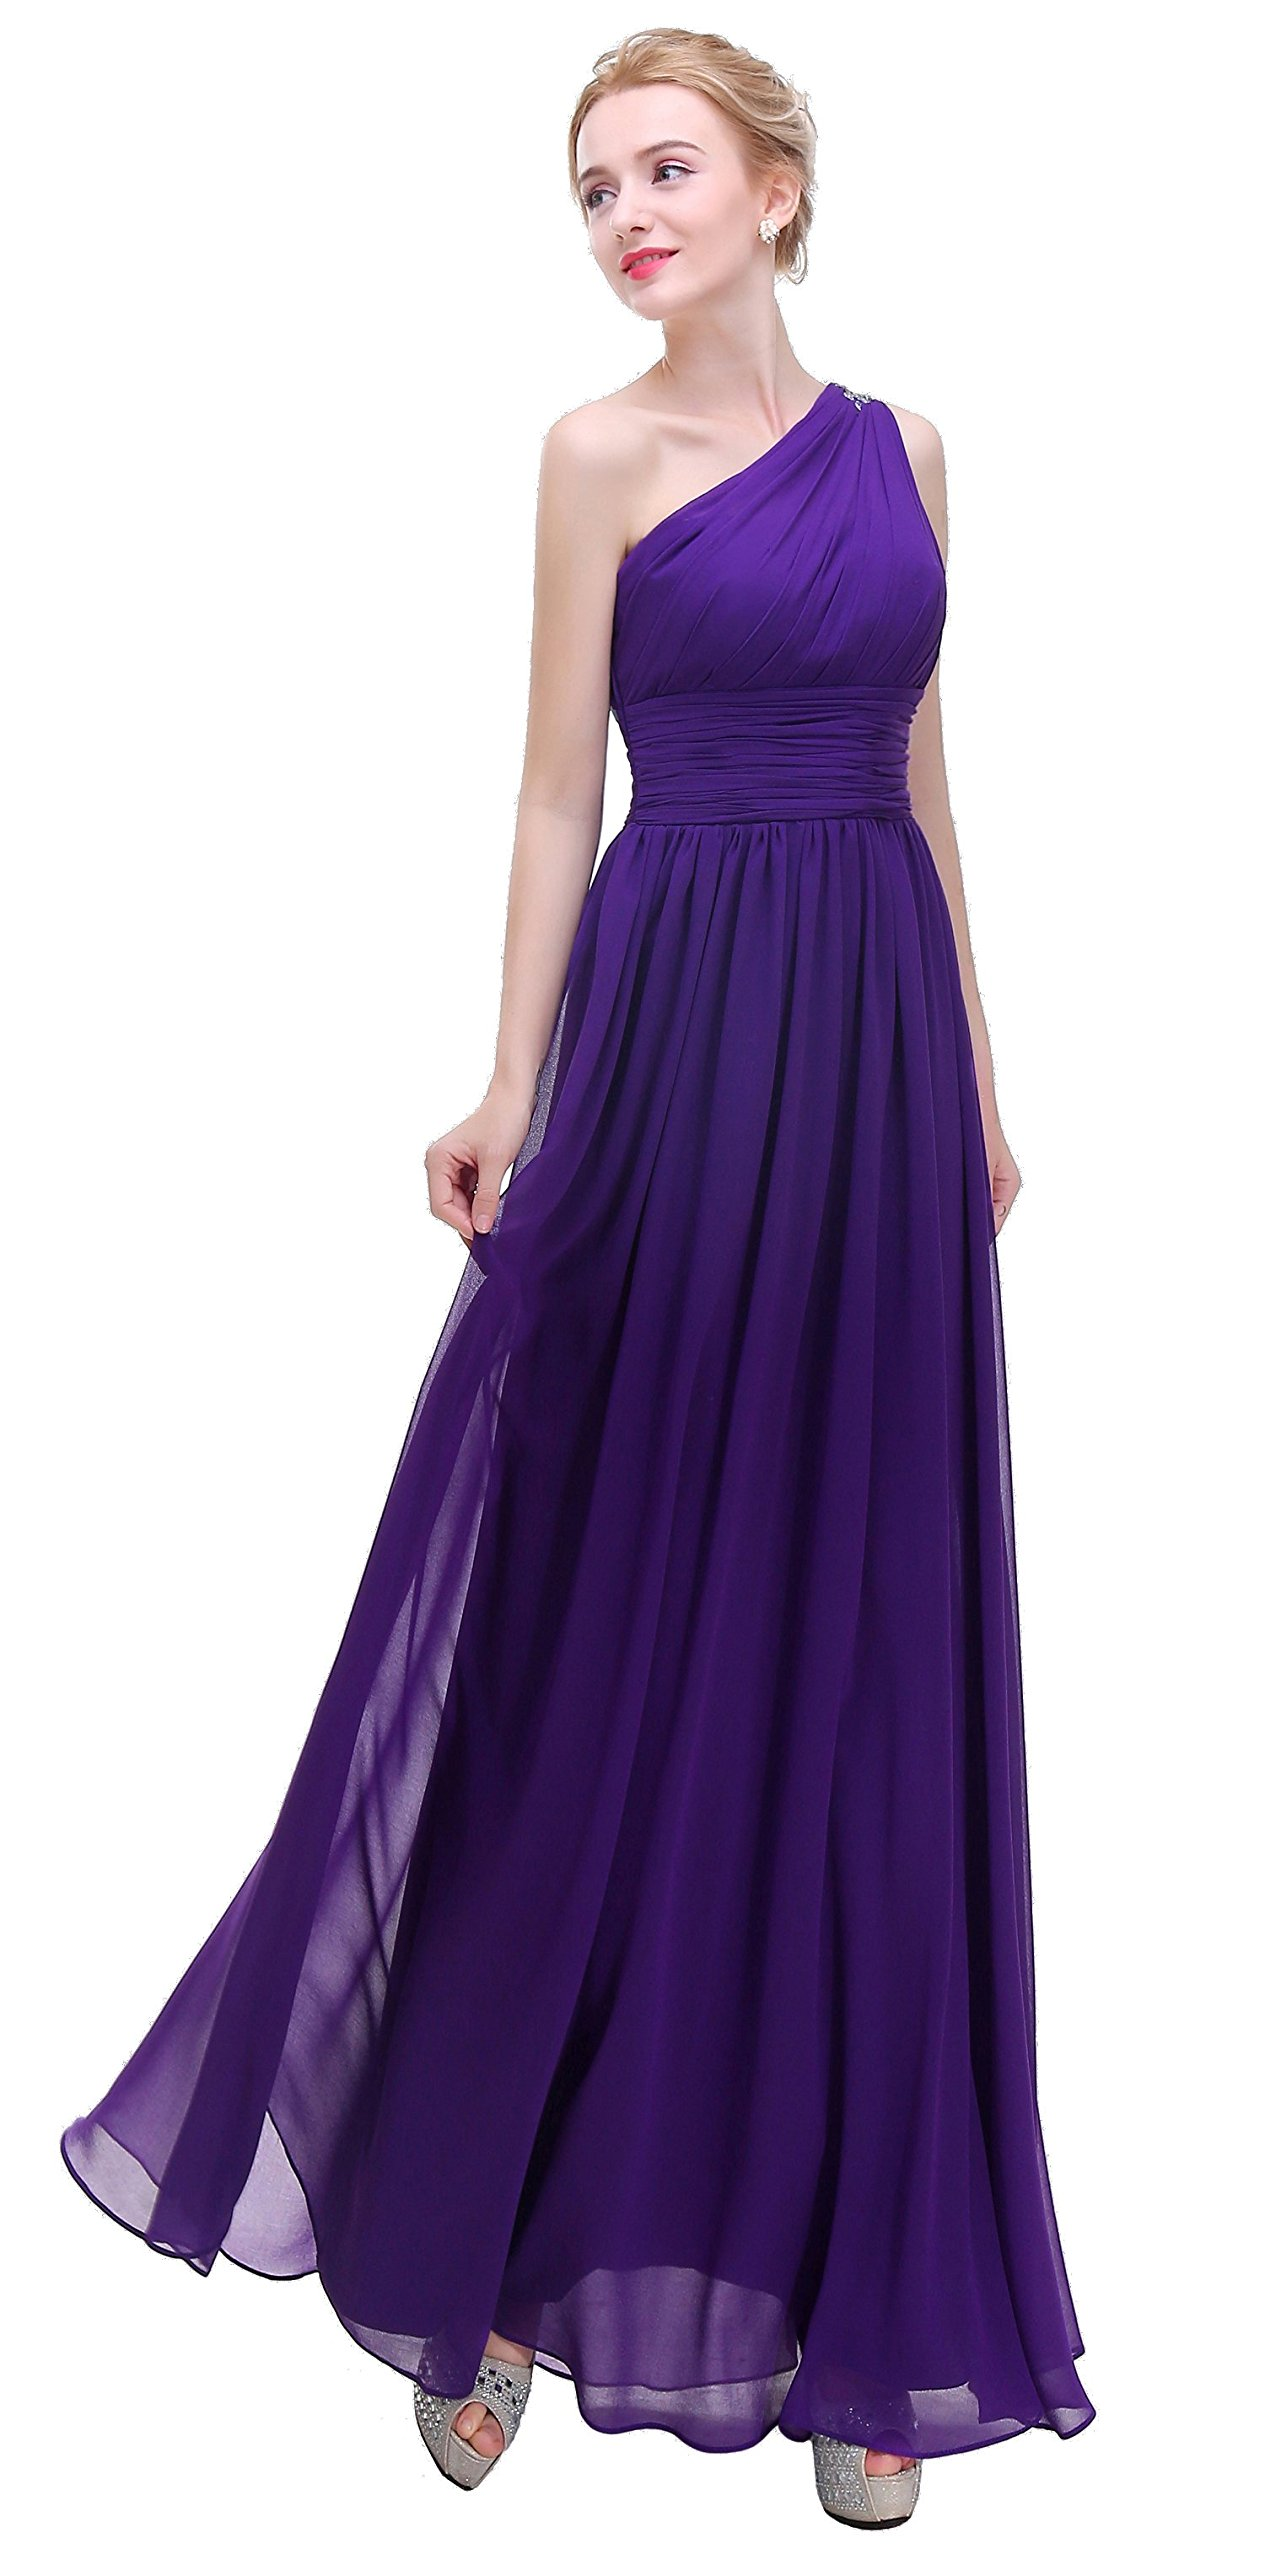 Dark Purple Long Prom Dresses: Amazon.com